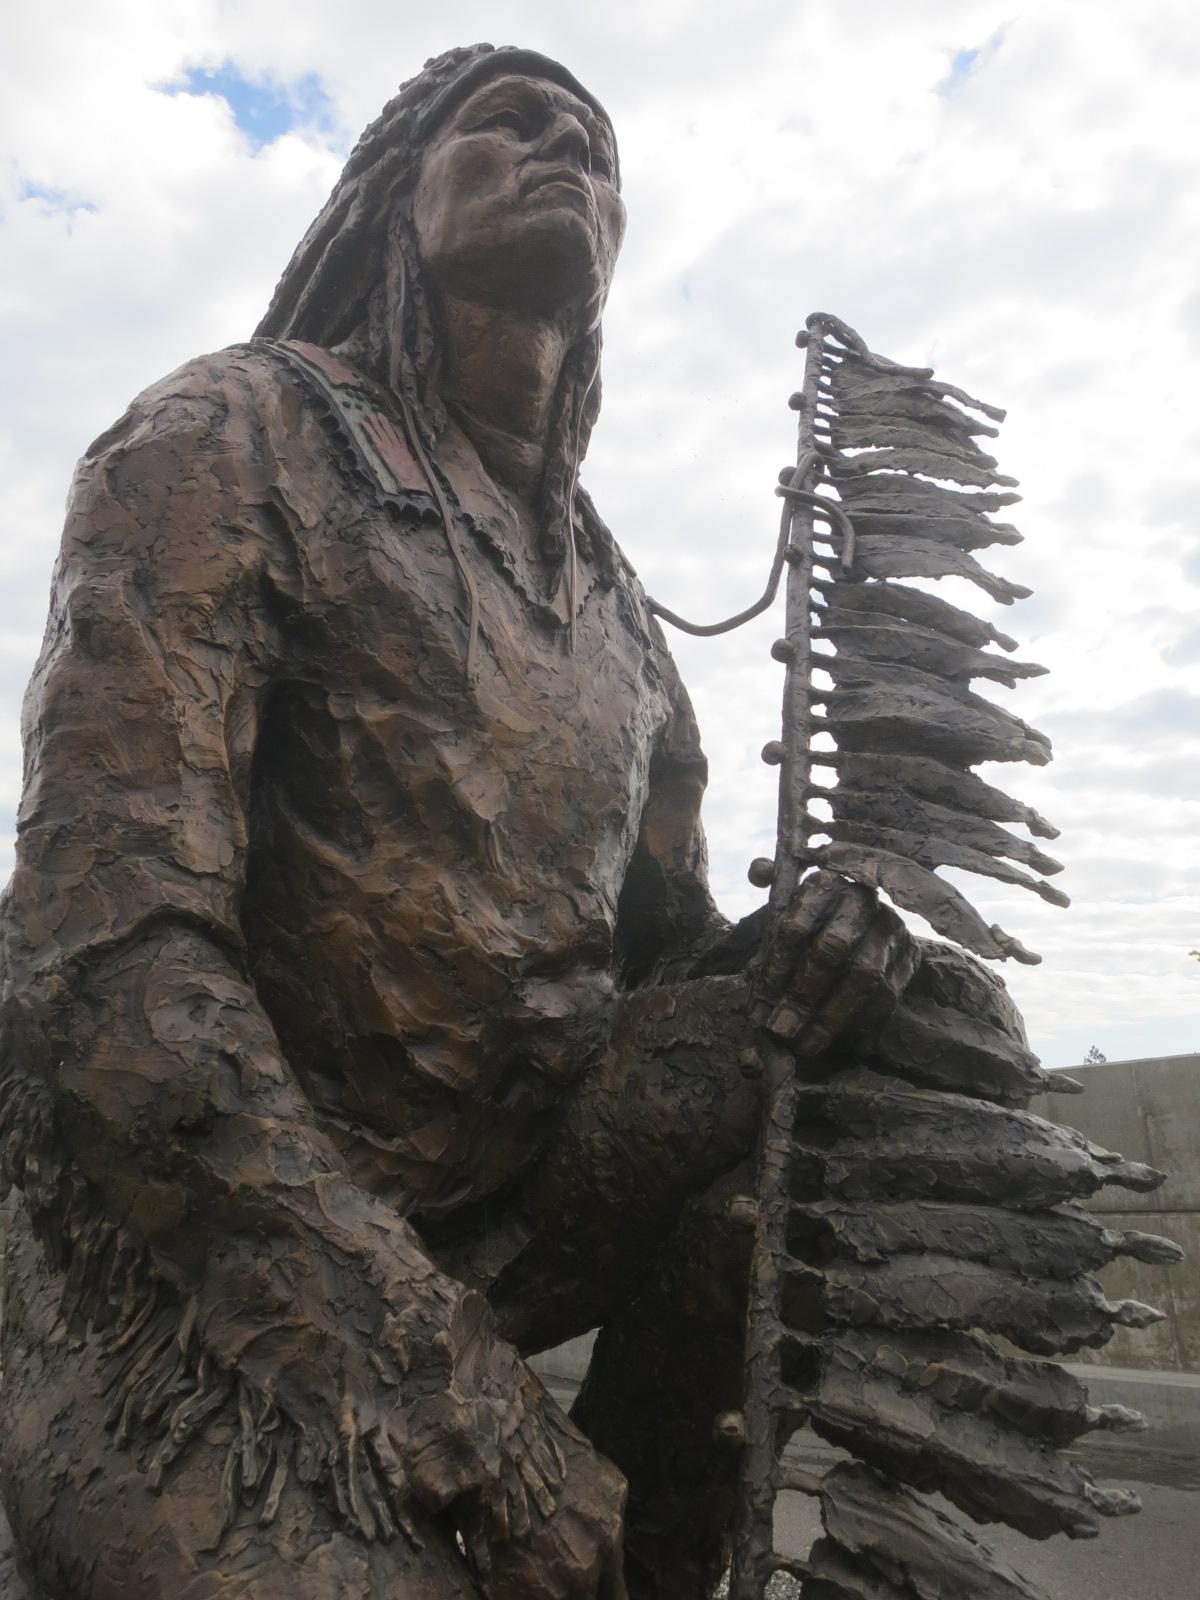 Statue of Chief Morris Antelope